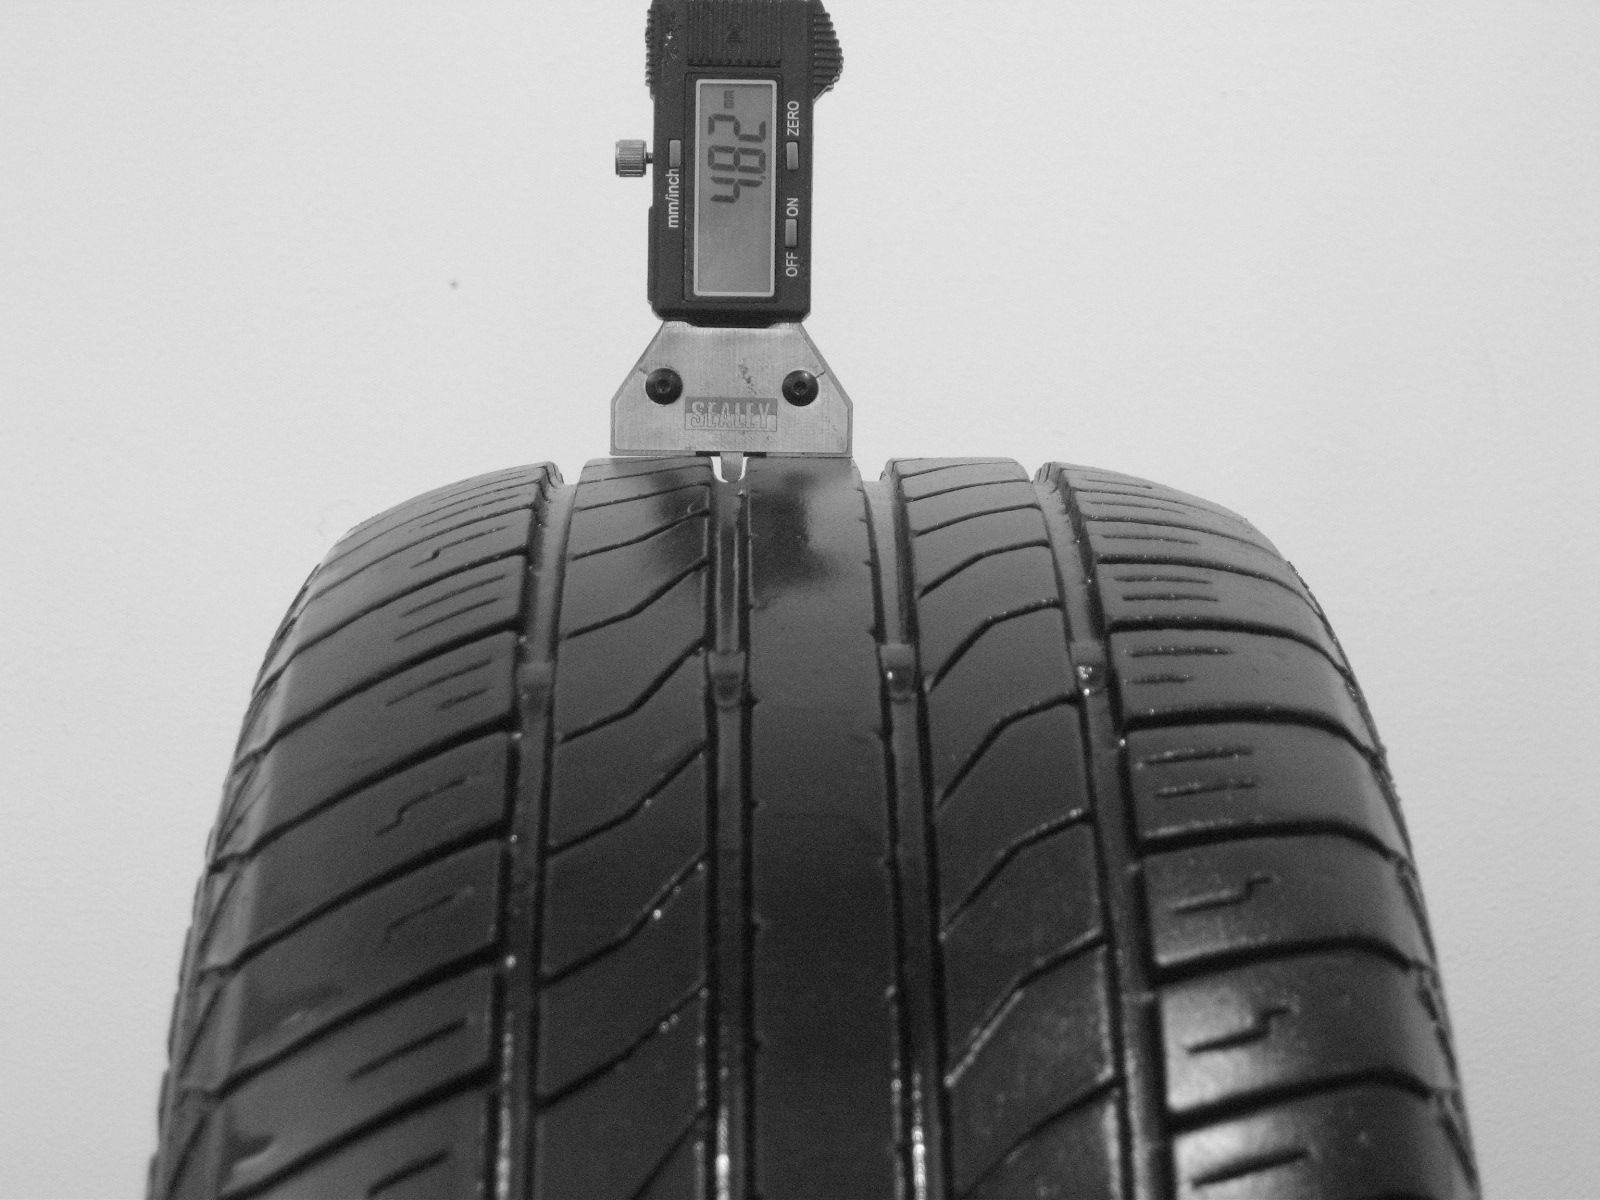 Použité-Pneu-Bazar - 195/55 R15 CONTINENTAL SPORT CONTACT CV90 -kusovka-rezerva 3mm